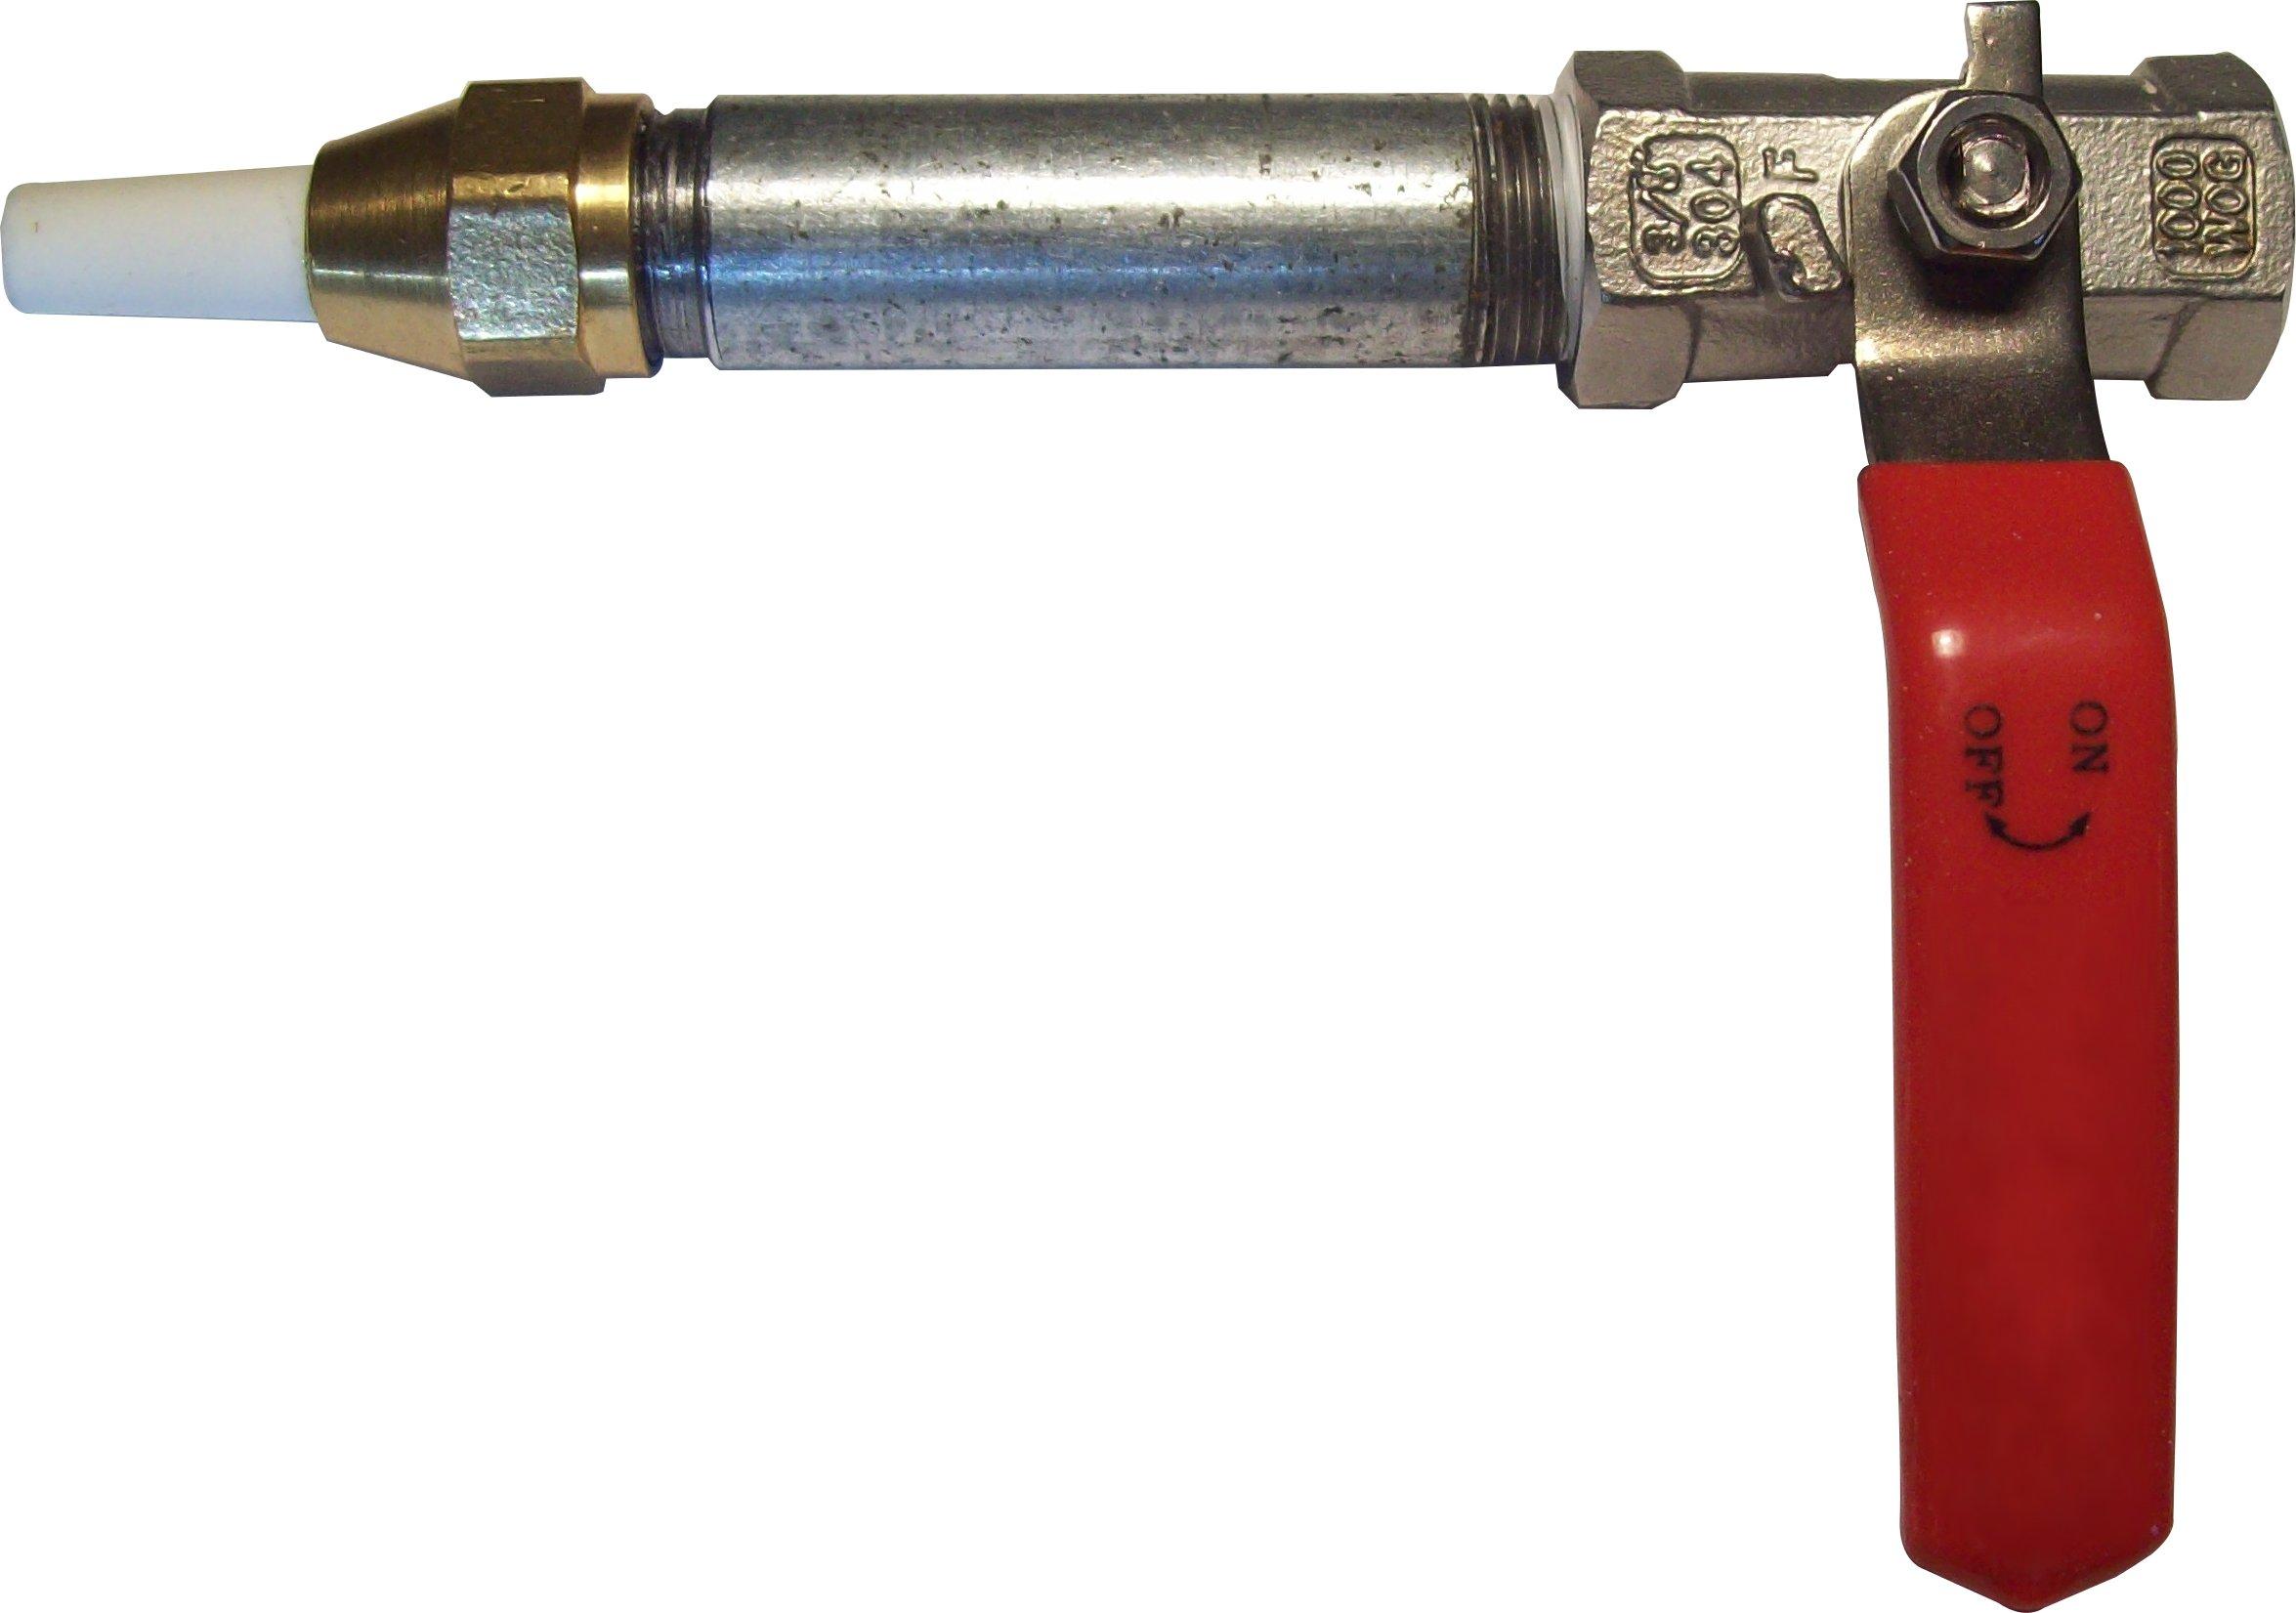 Sandblaster Nozzle Gun with Holder, Valve, Tip, Long-Lasting Steel